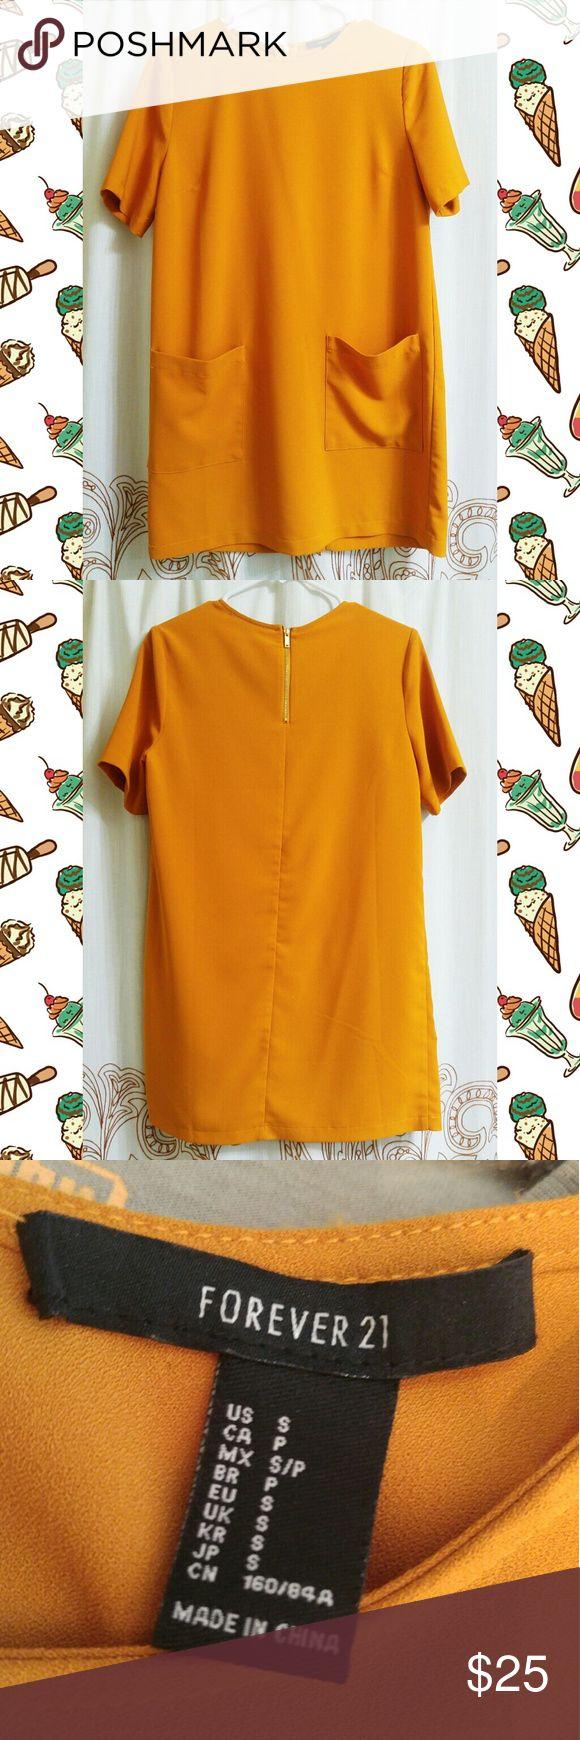 NWOT! Forever 21 Mustard Yellow Dress w/Pockets Never been worn. Very 1960s mod vibe! Gold zipper on back. Forever 21 Dresses Mini